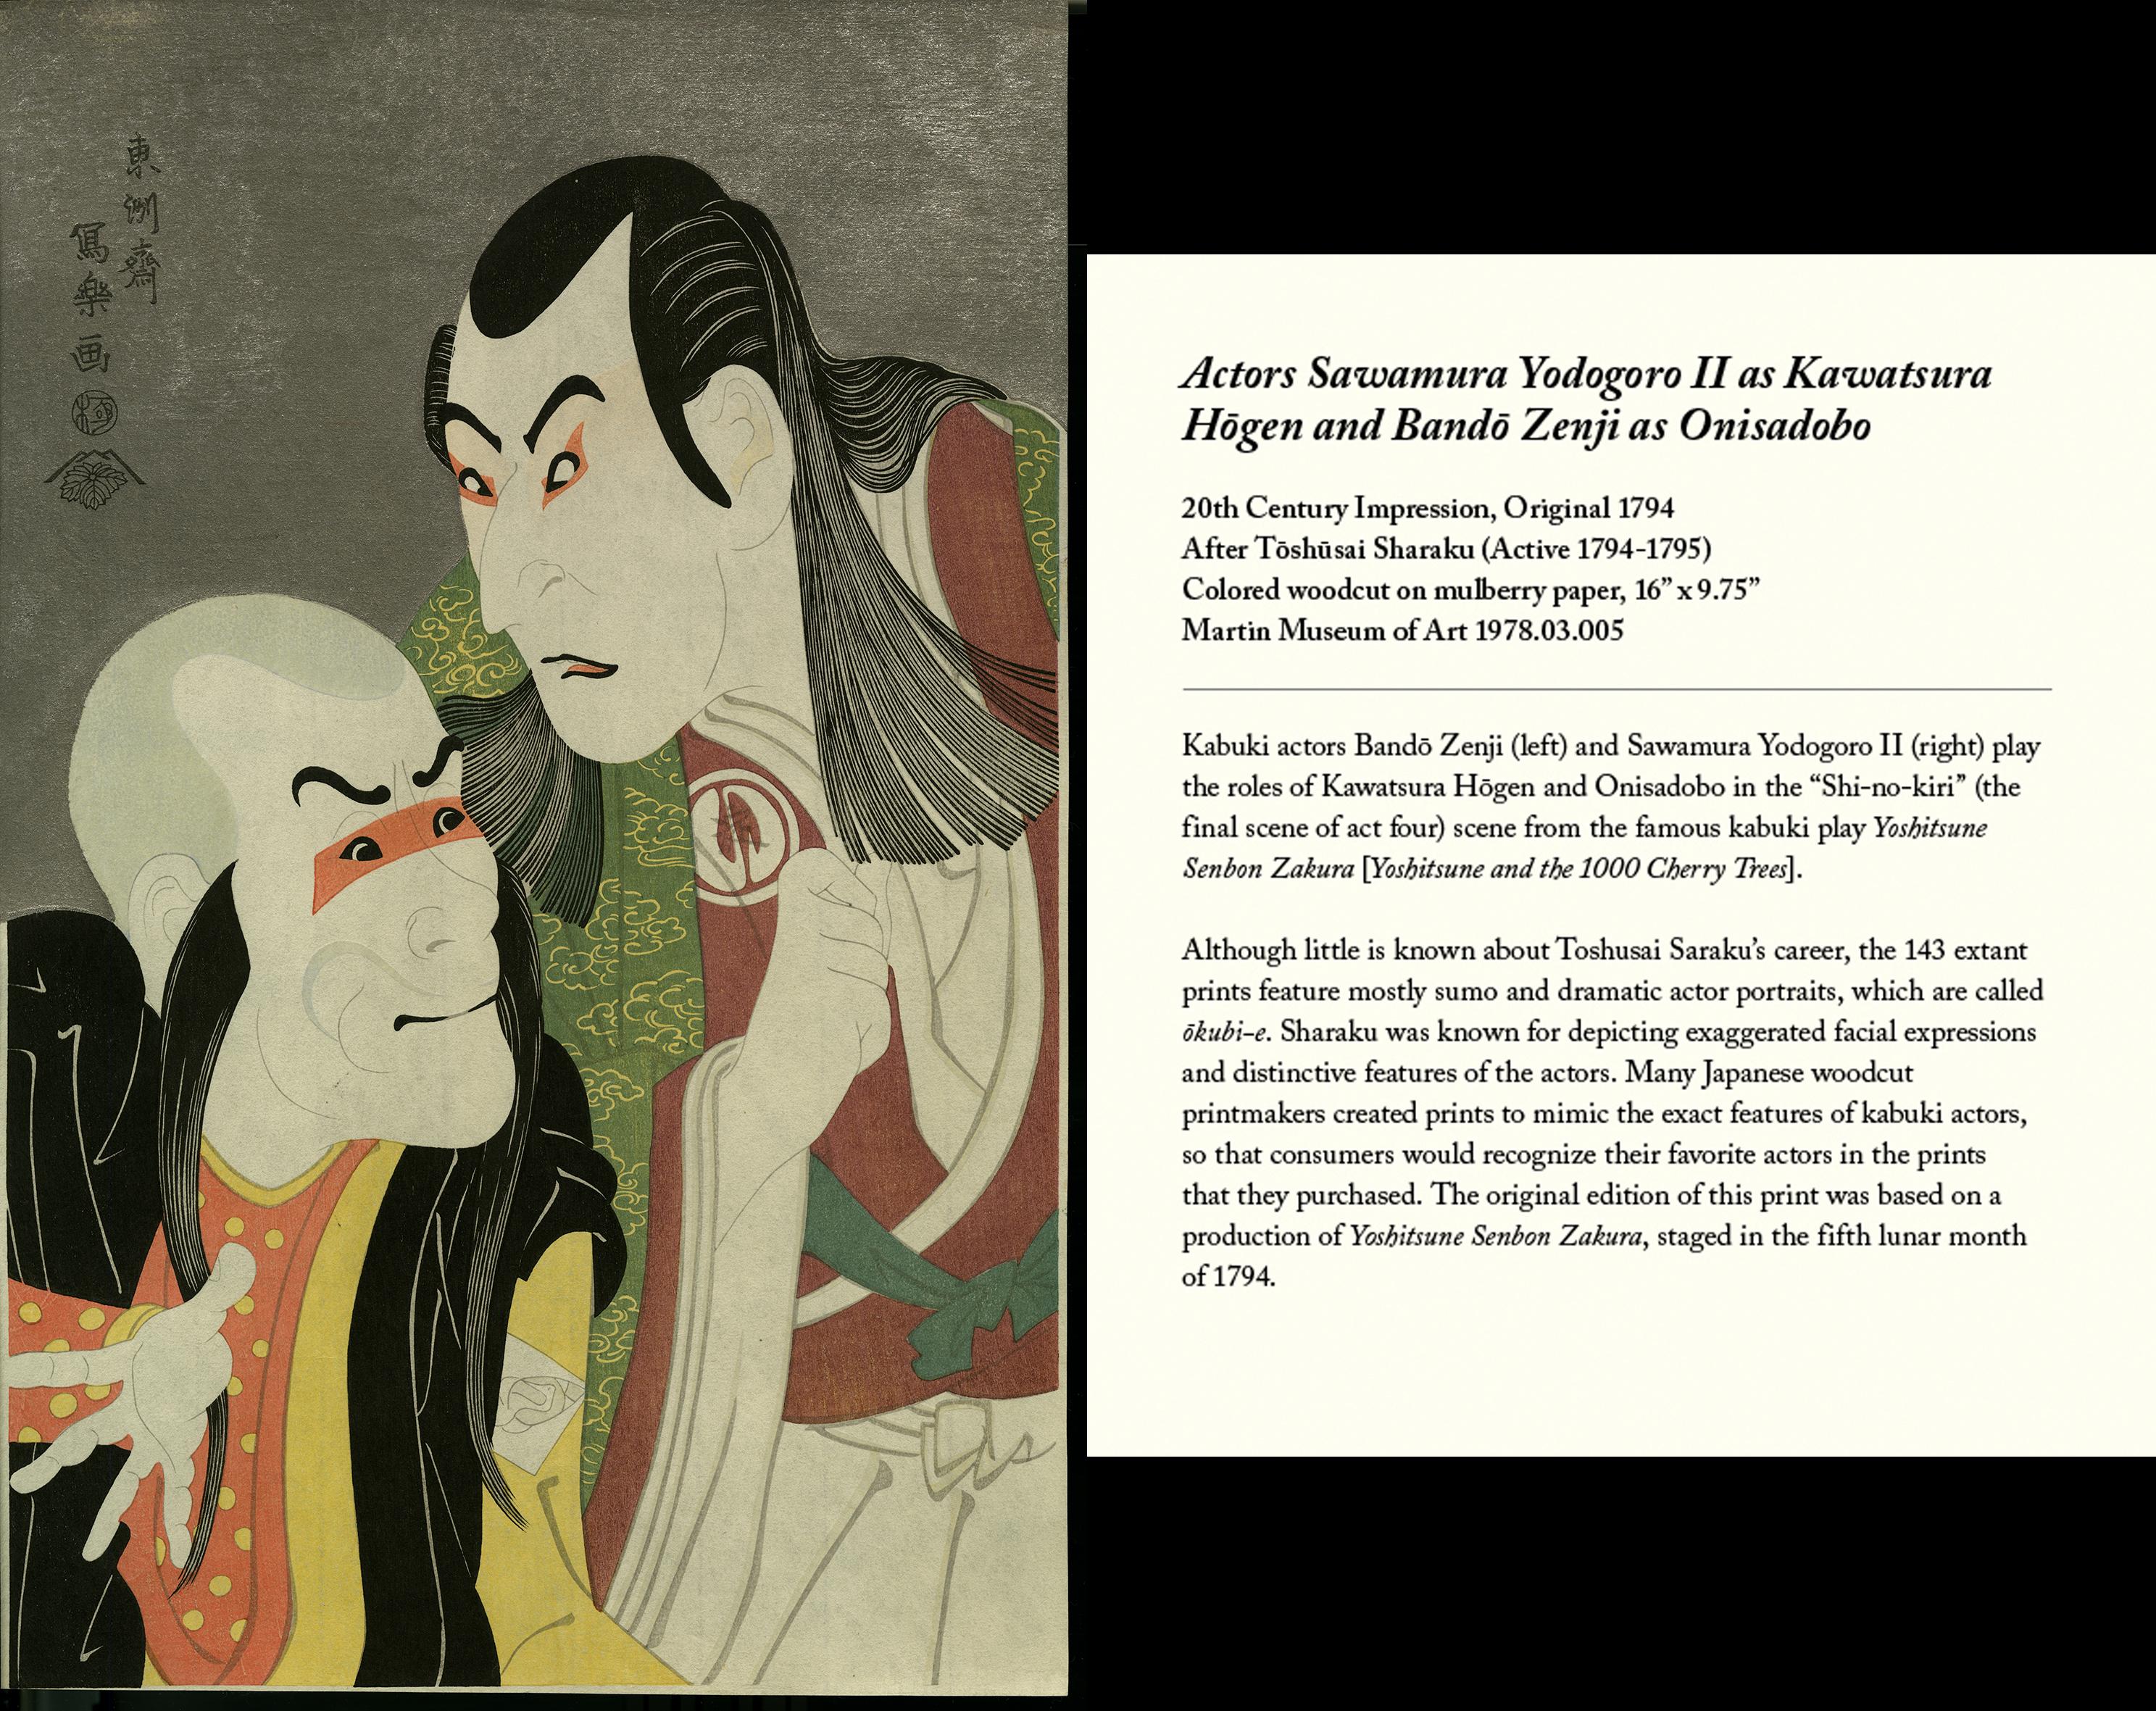 Actors Sawamura Yodogoro II and Bando Zenji